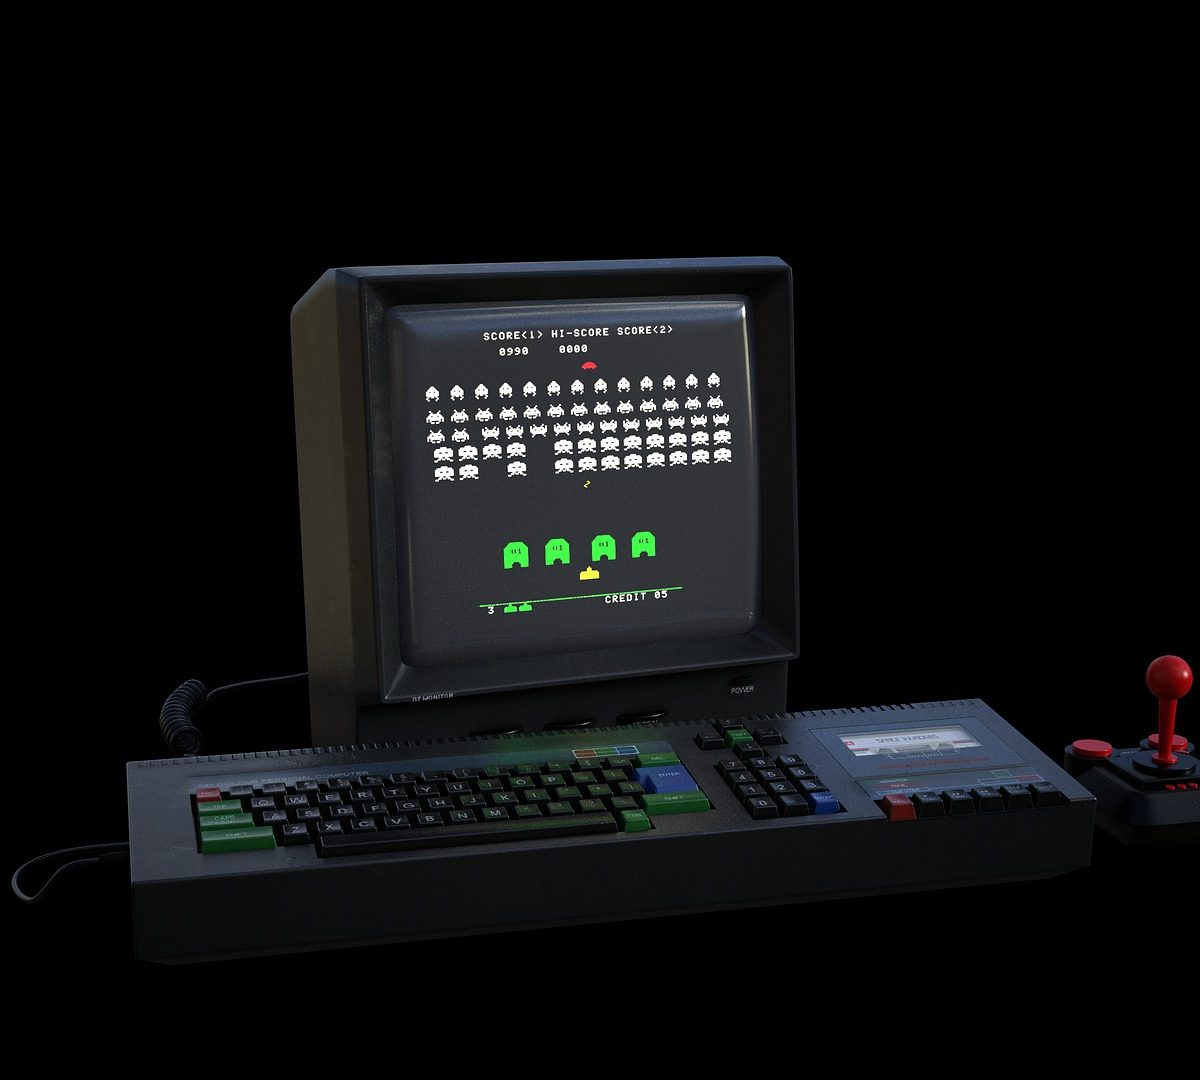 A screen shot of a computer